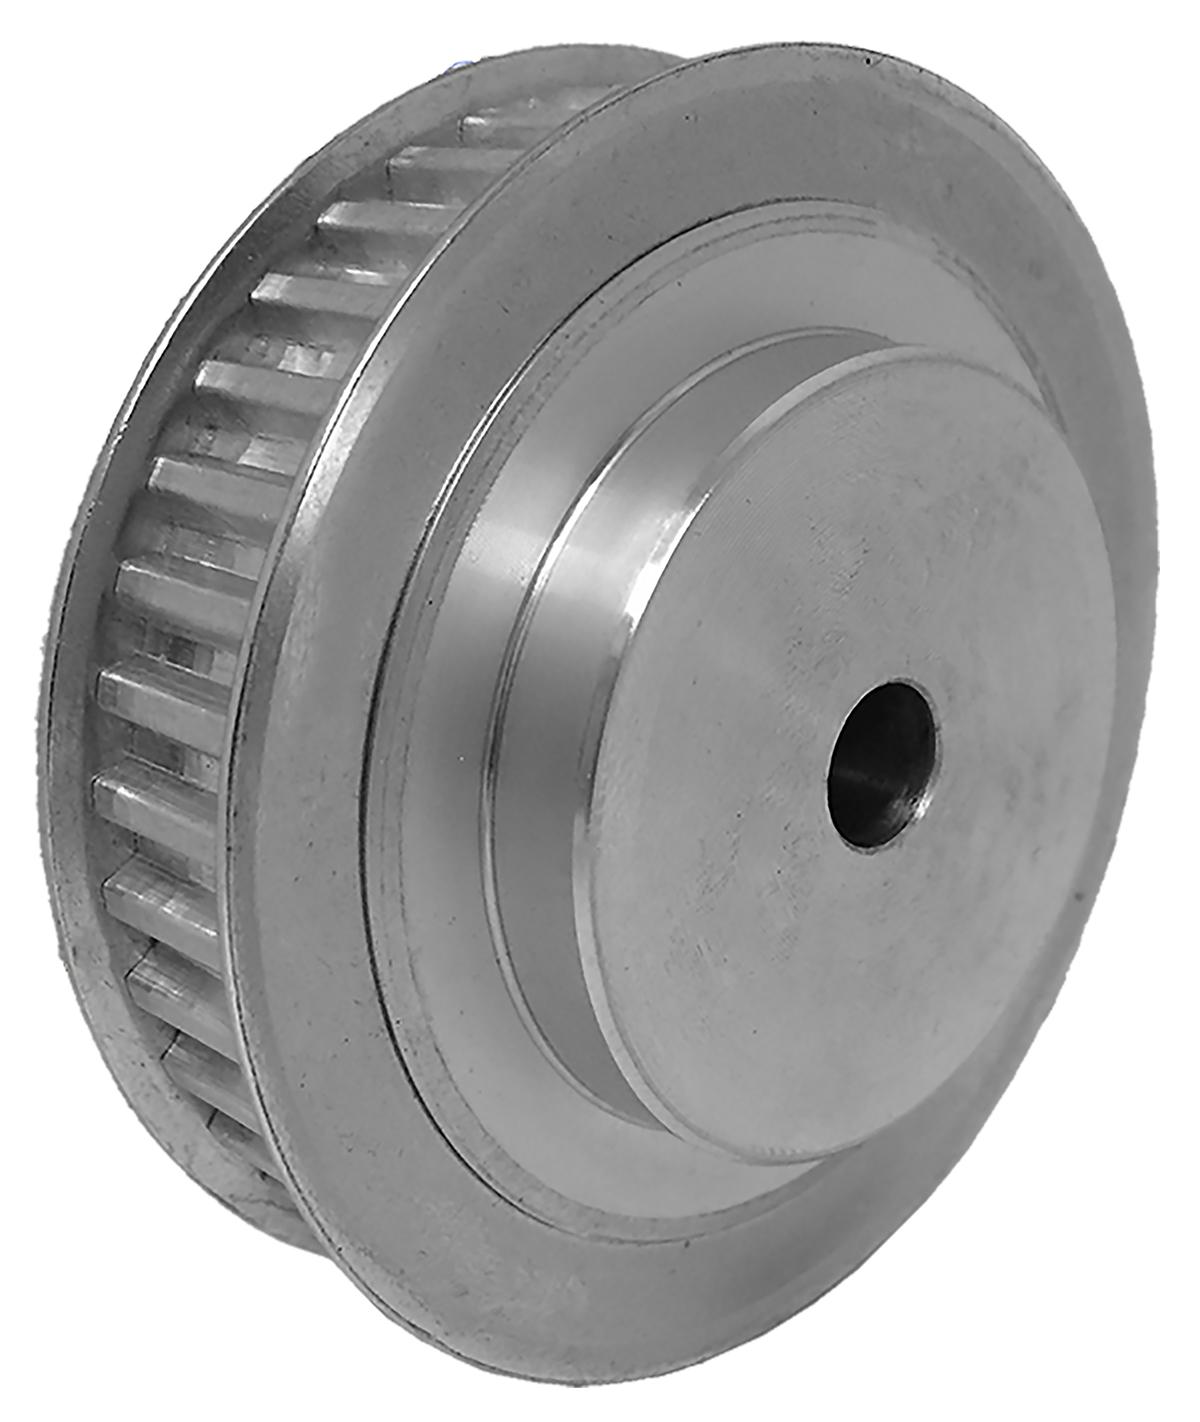 21T5/40-2 - Aluminum Metric Pulleys